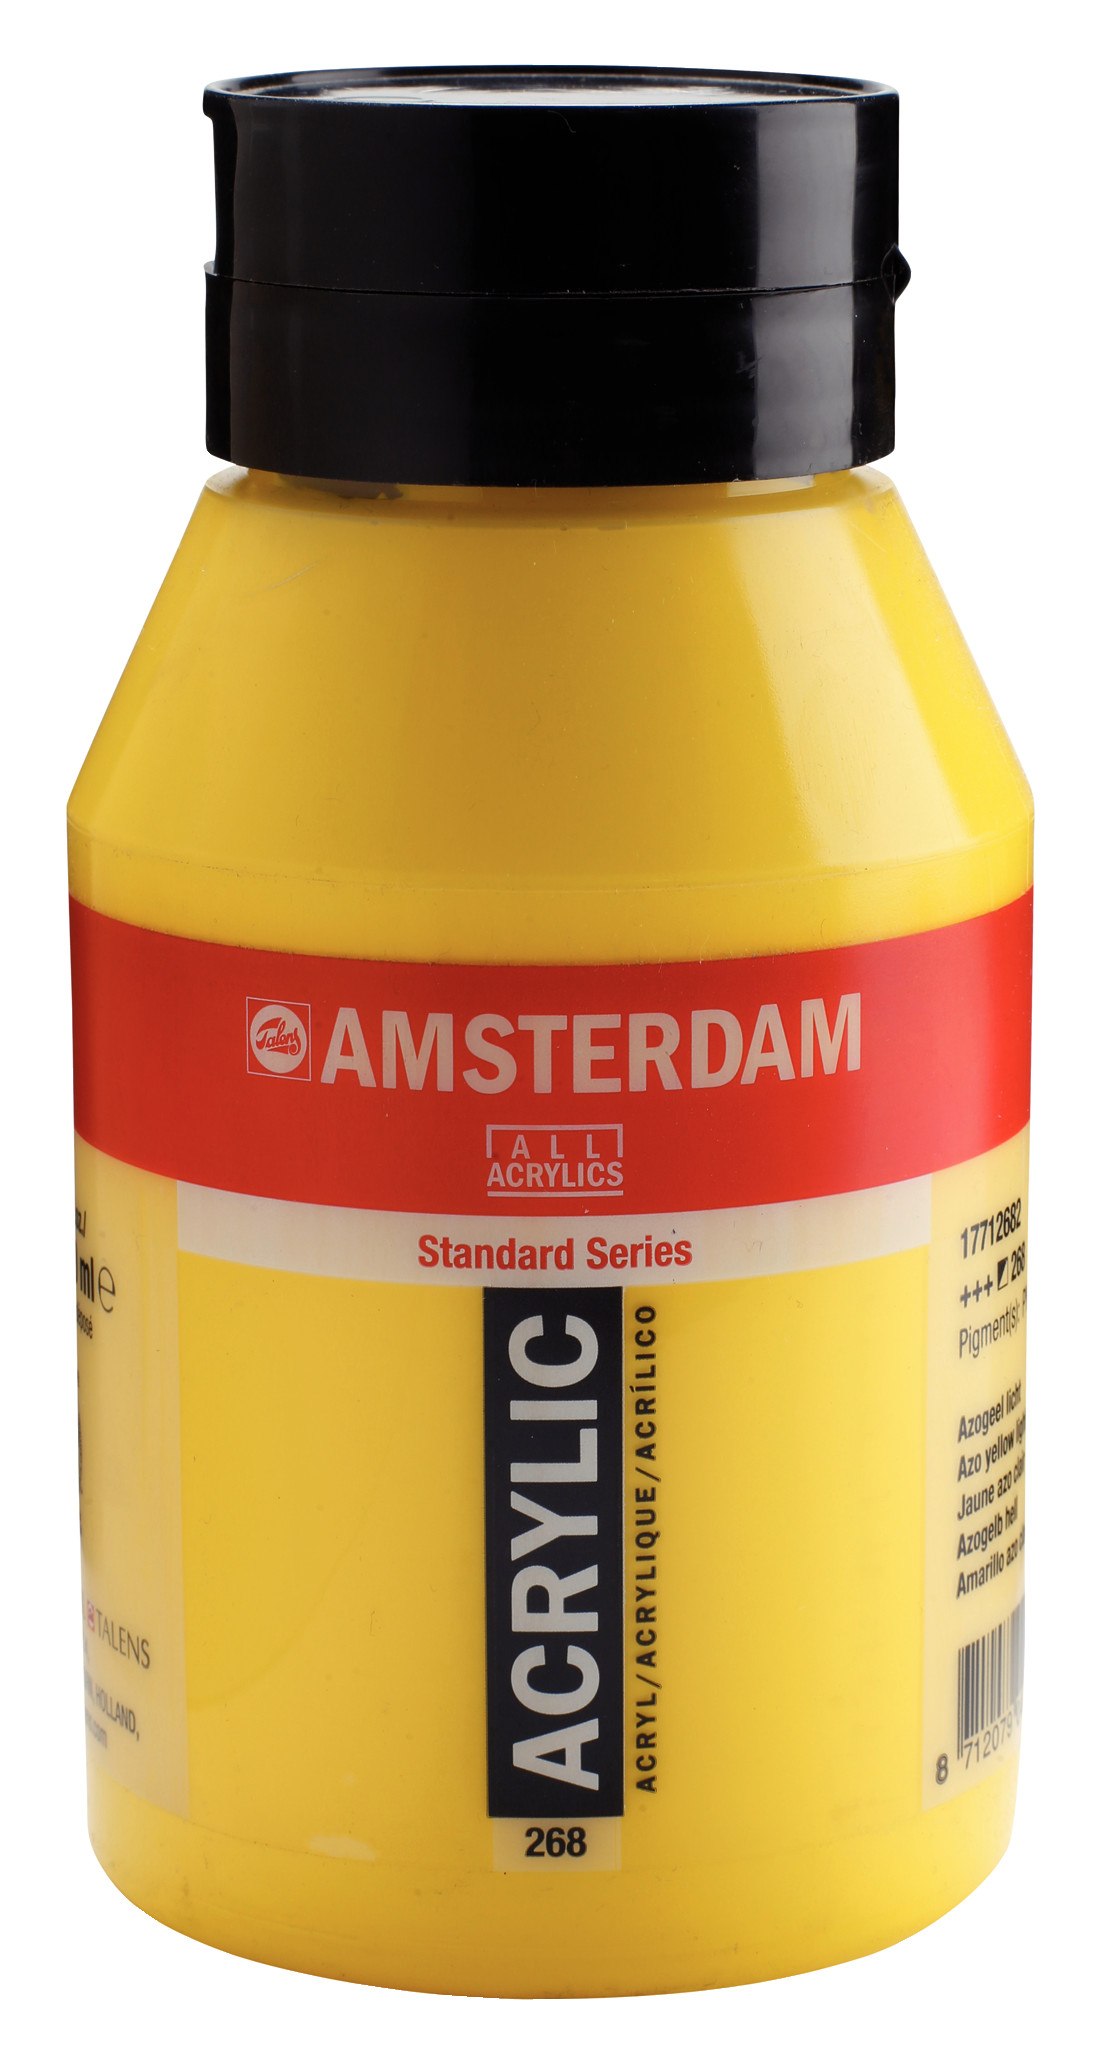 Amsterdam Standard Series Acrylic Jar 1000 ml Azo yellow light 268